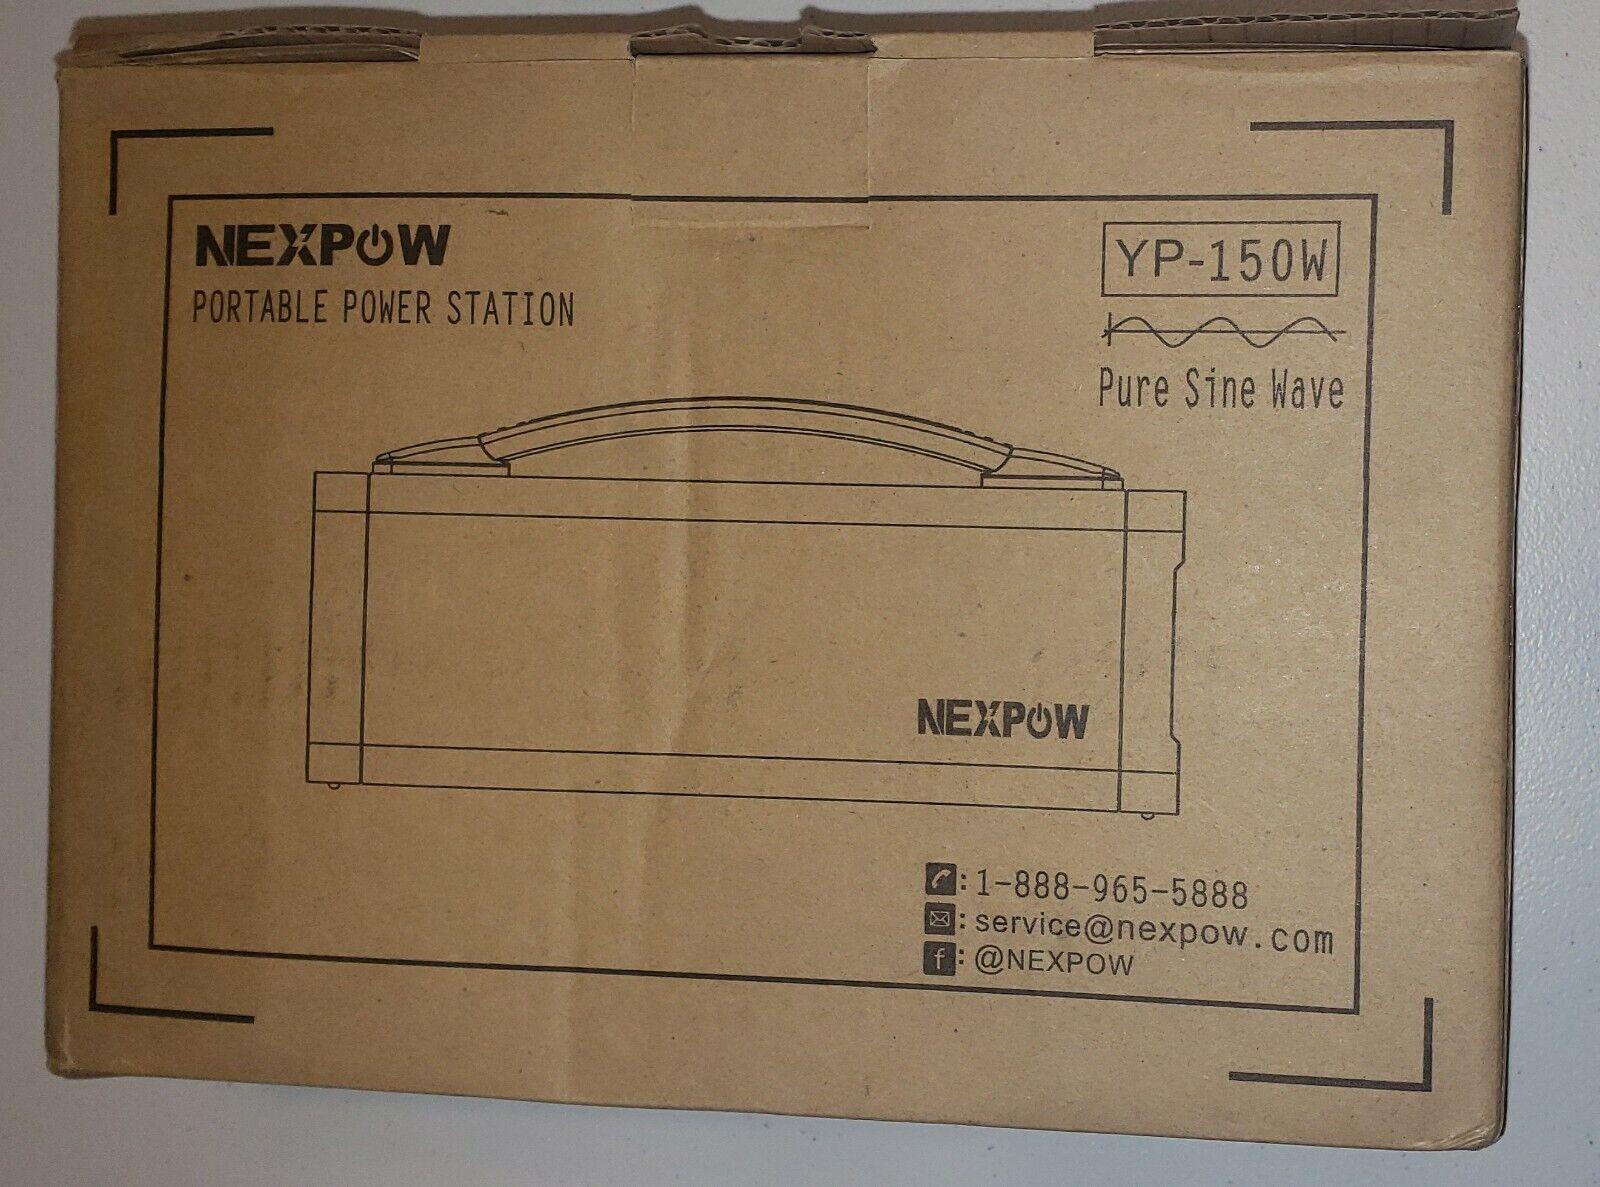 Nexpow Black YP-150W Pure Sine Wave Portable Power Station ~ Open Box